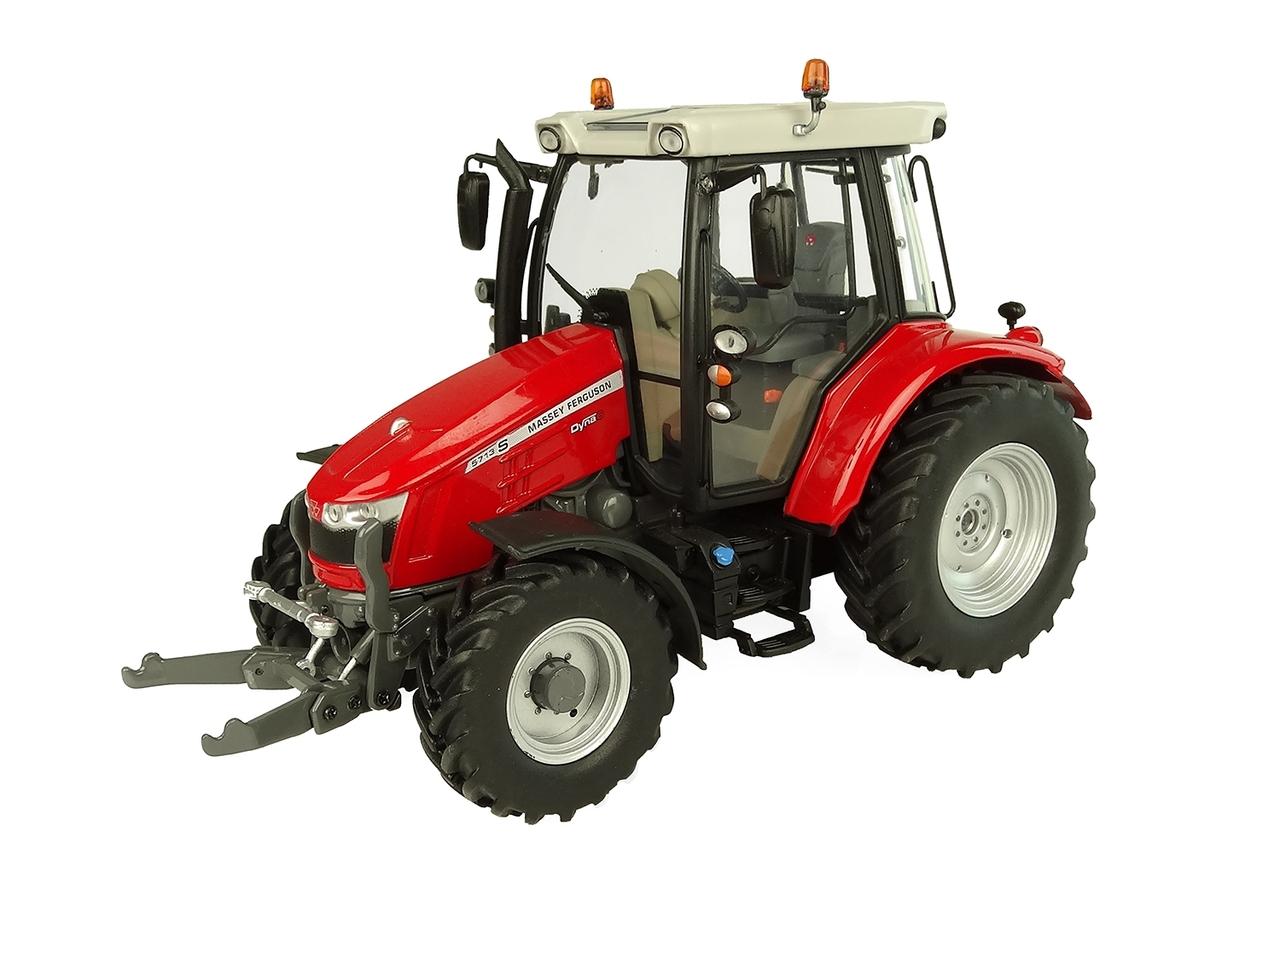 Massey Ferguson 5713 S Tractor 1/32 Diecast Model by Universal Hobbies